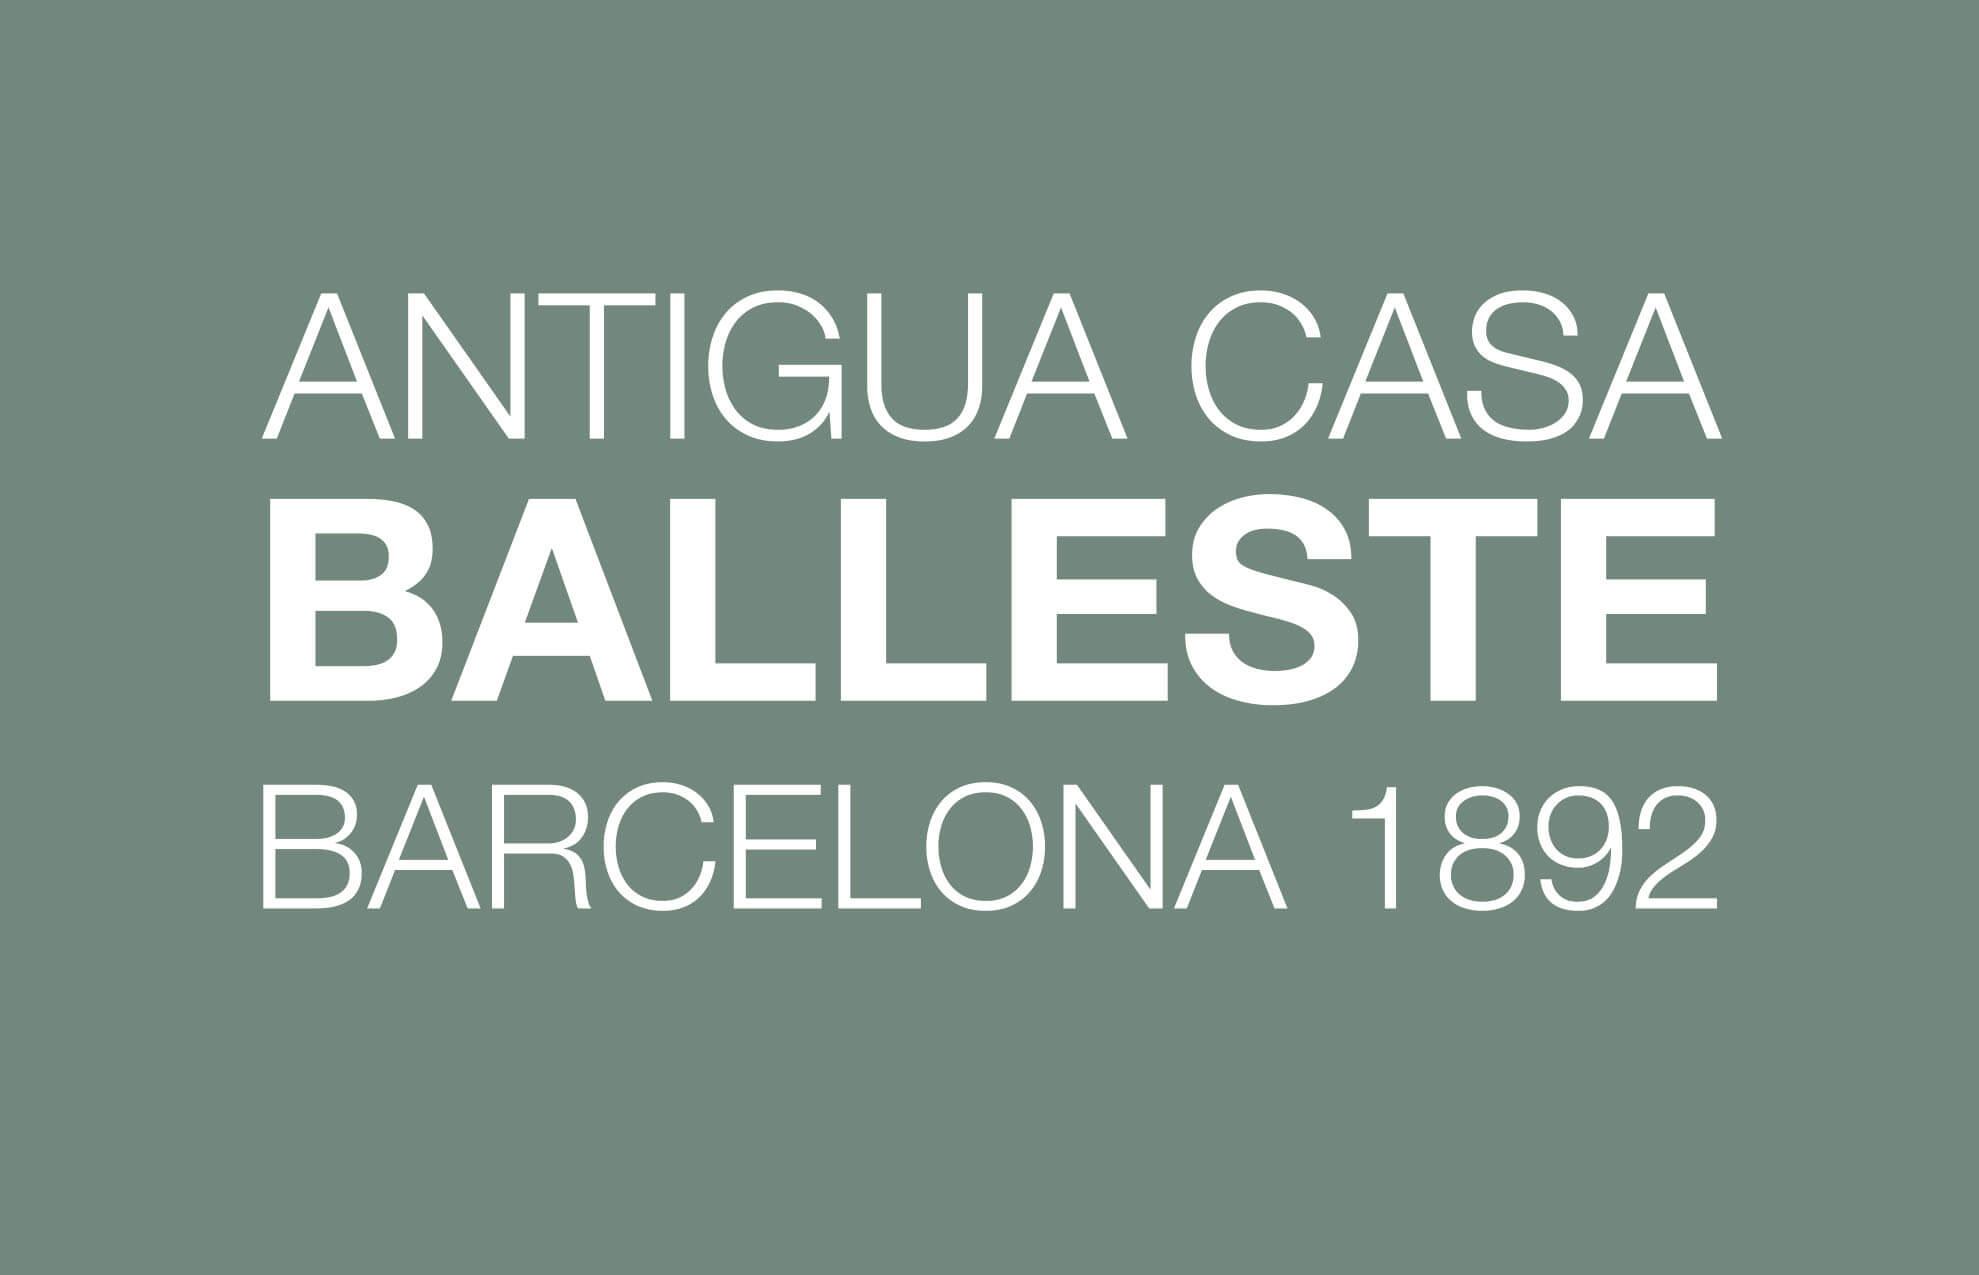 rediseno logotipo casa balleste barcelona2 - Restyling. Branding. Fashion